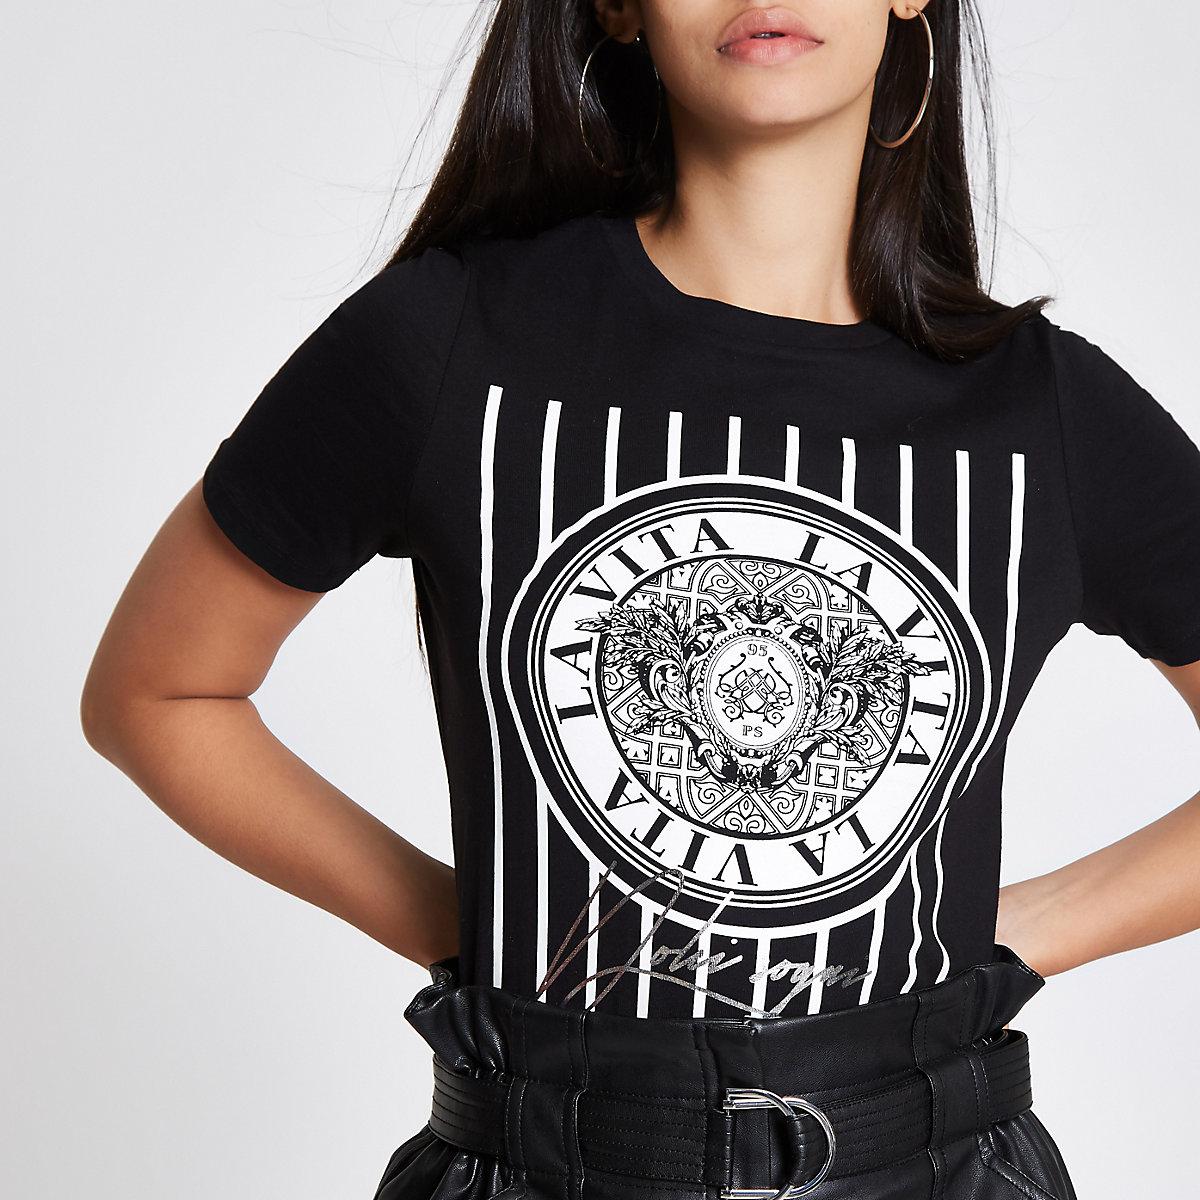 Black 'La Vita' print T-shirt